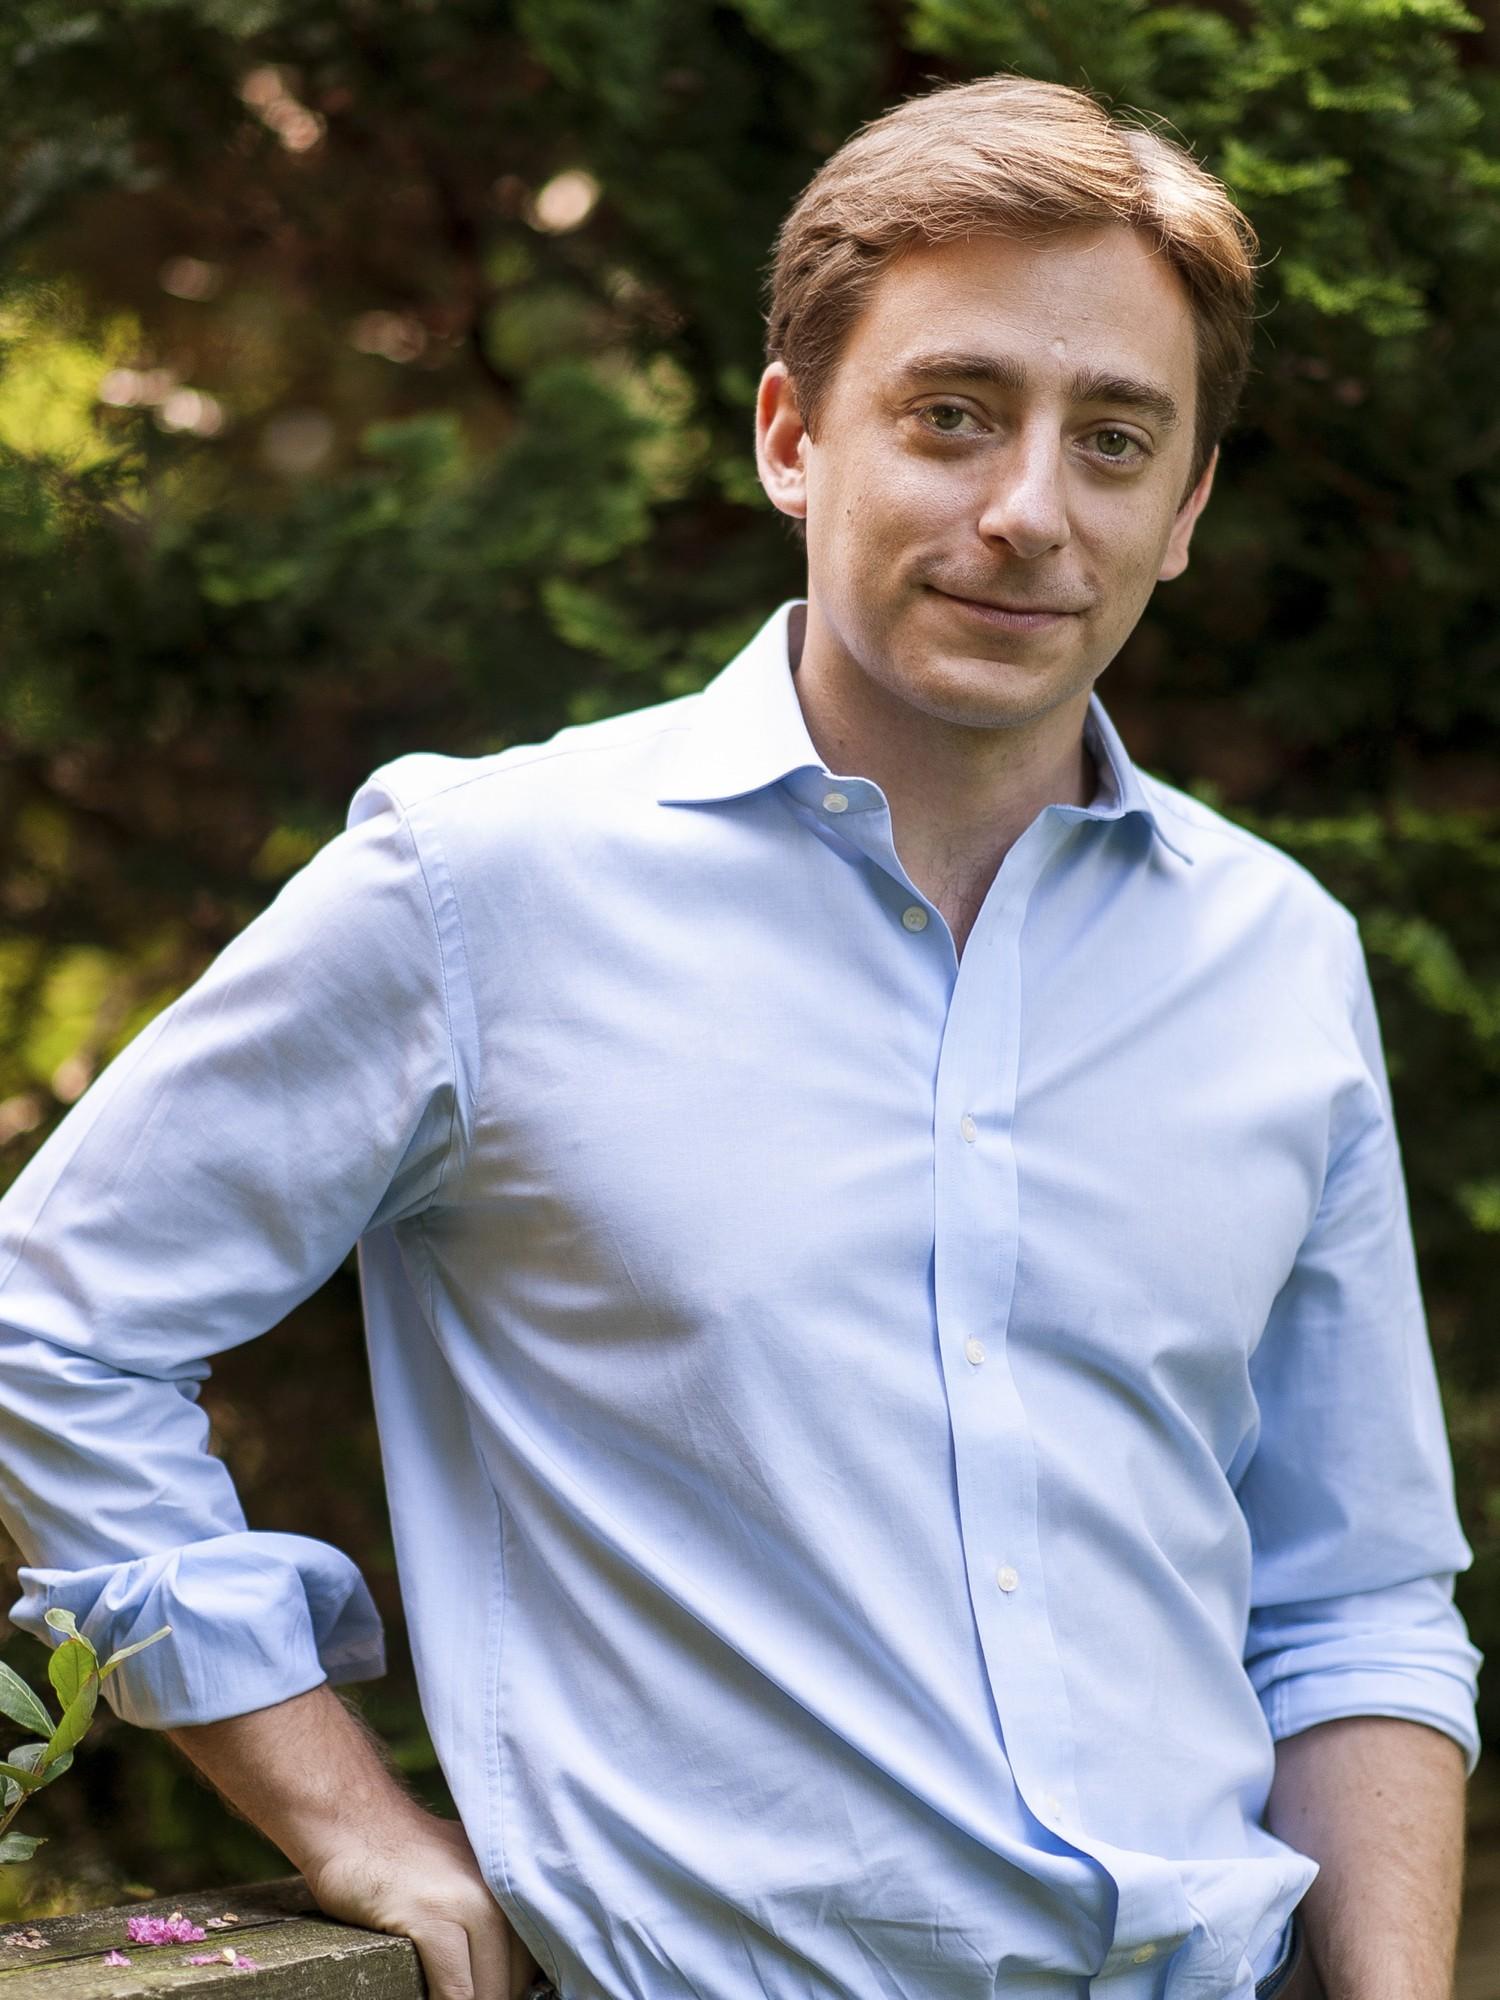 Author Evan Osnos